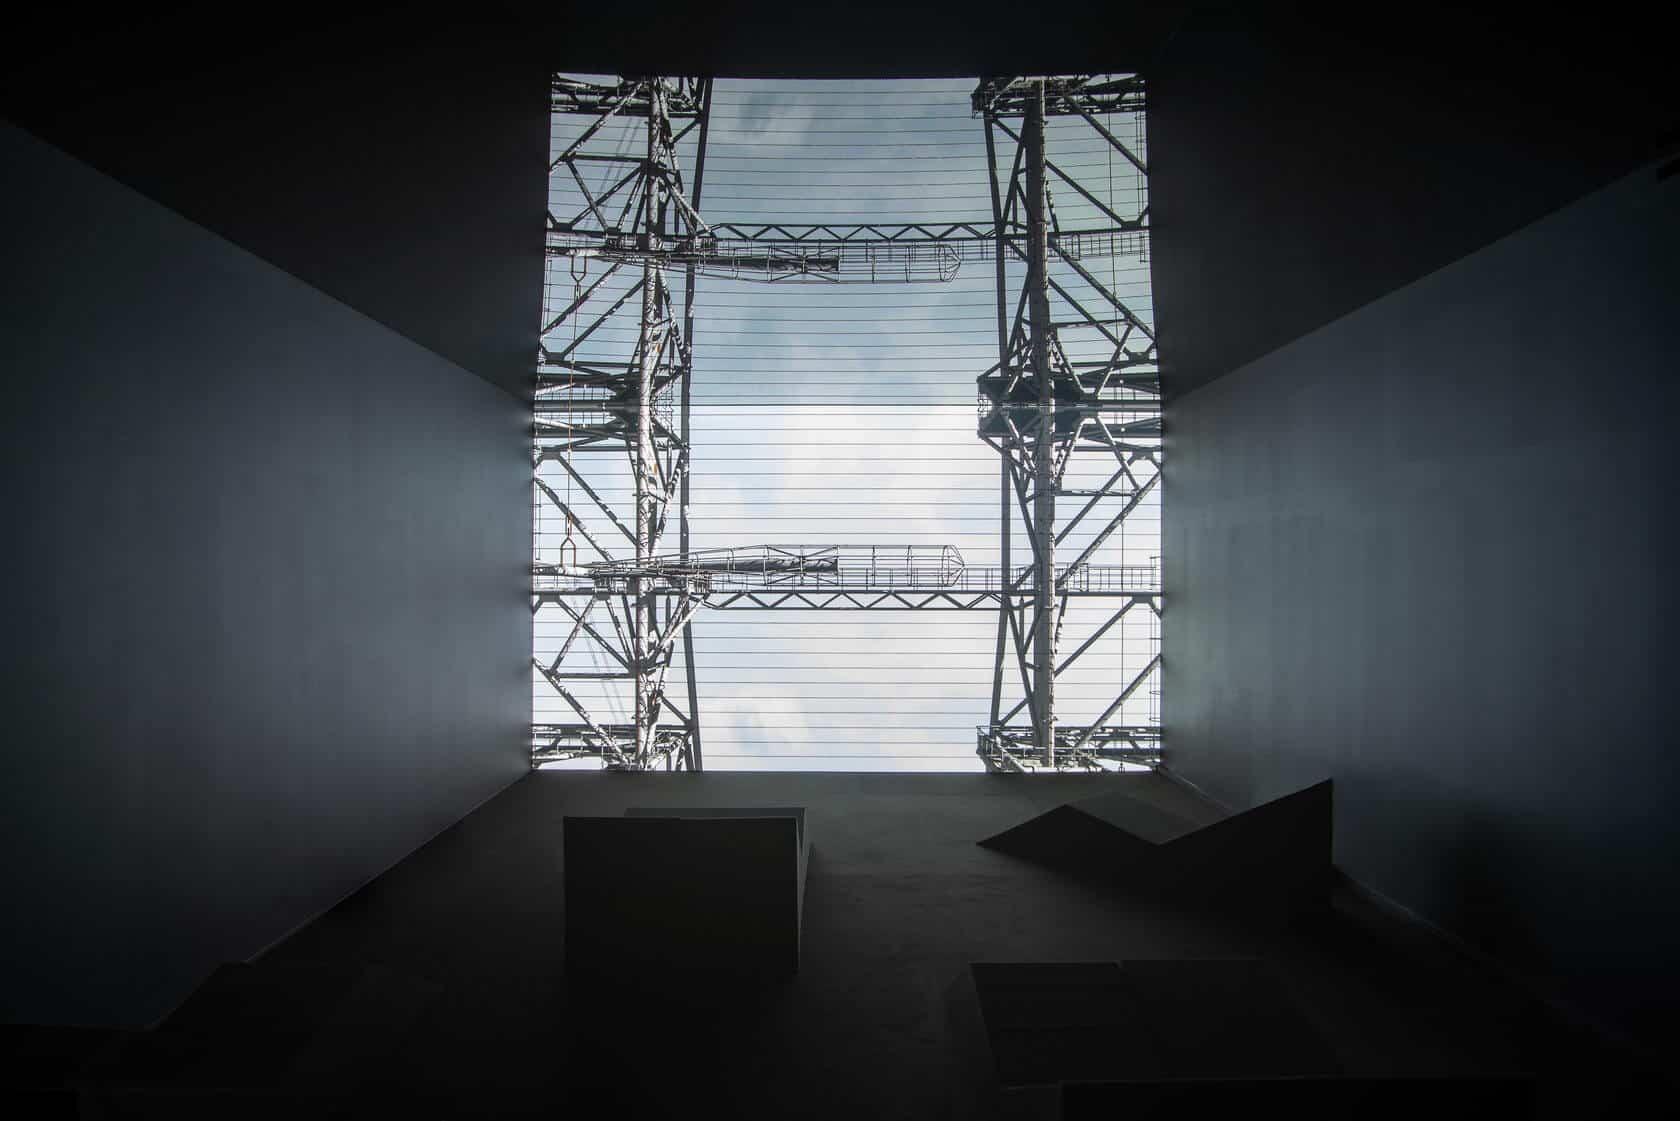 "Emilija Škarnulytė, t 1 ⁄ 2 (2019). Video, 3D remote sensing scanning, 18'00"".  Image courtesy of the artist and PinchukArtCentre © 2019. Photographed by Maksim Belousov"